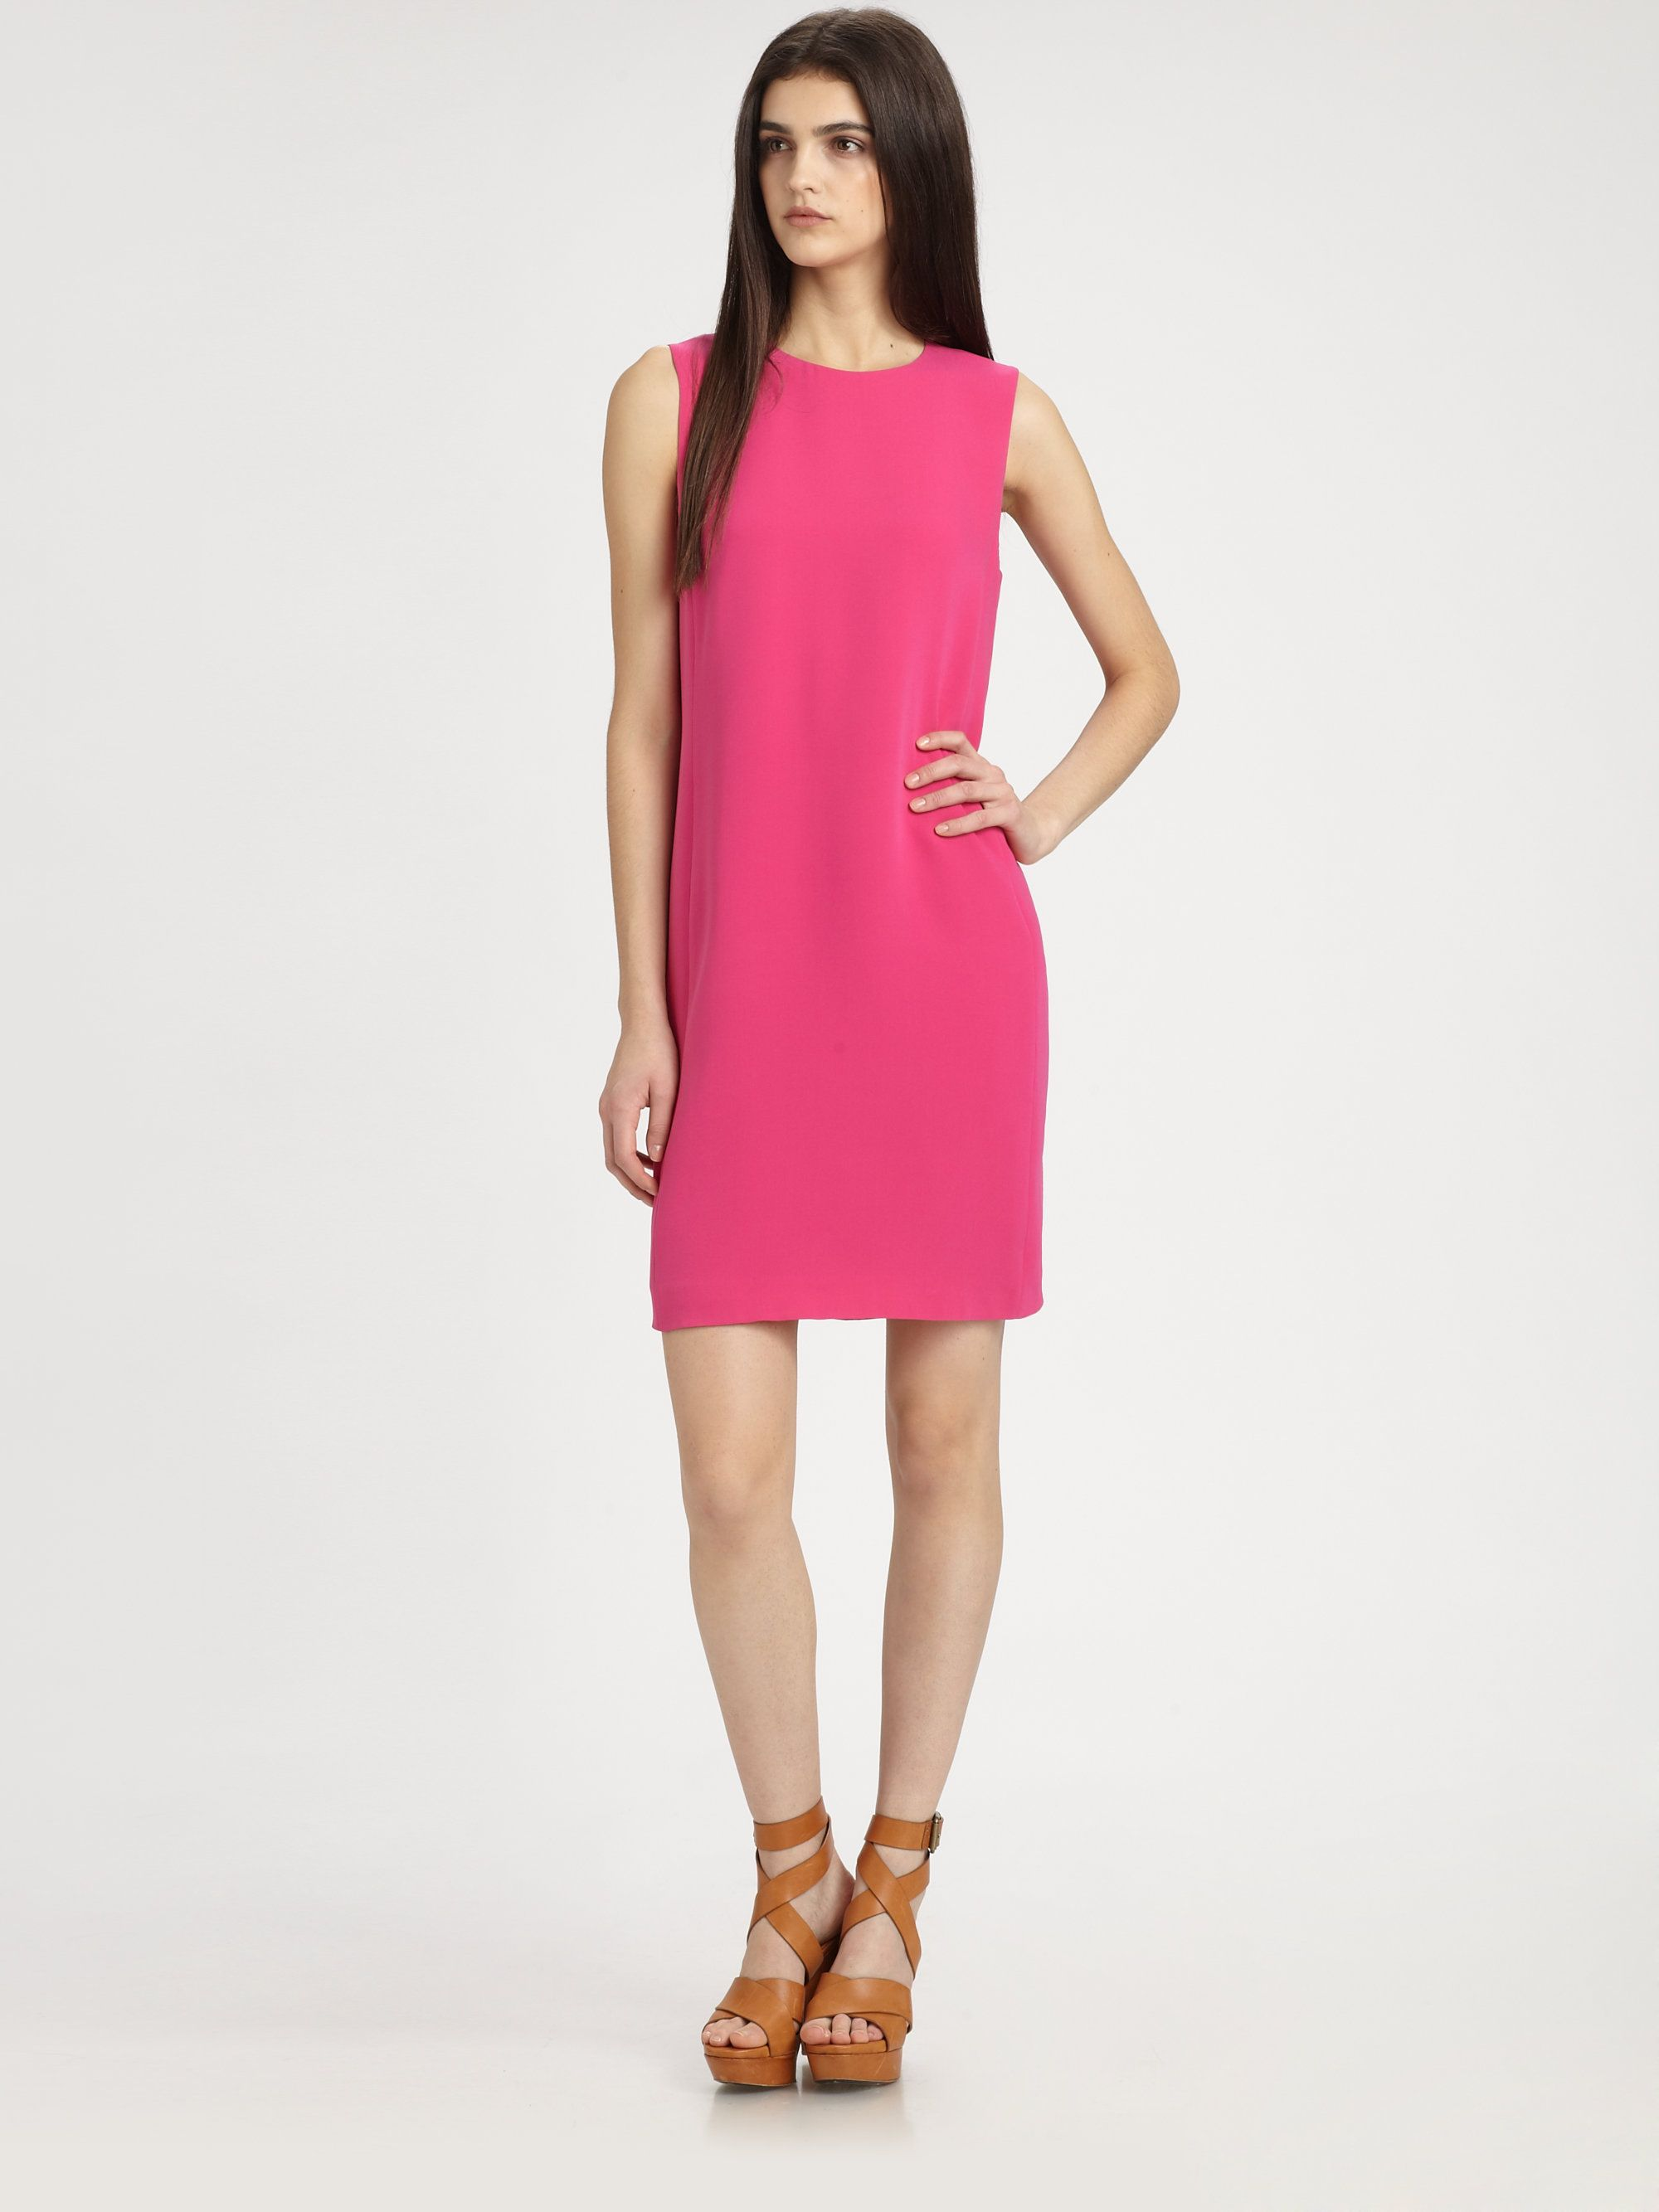 Women's Pink Sleeveless Silk Shift Dress | Silk, Hot pink and Clothing